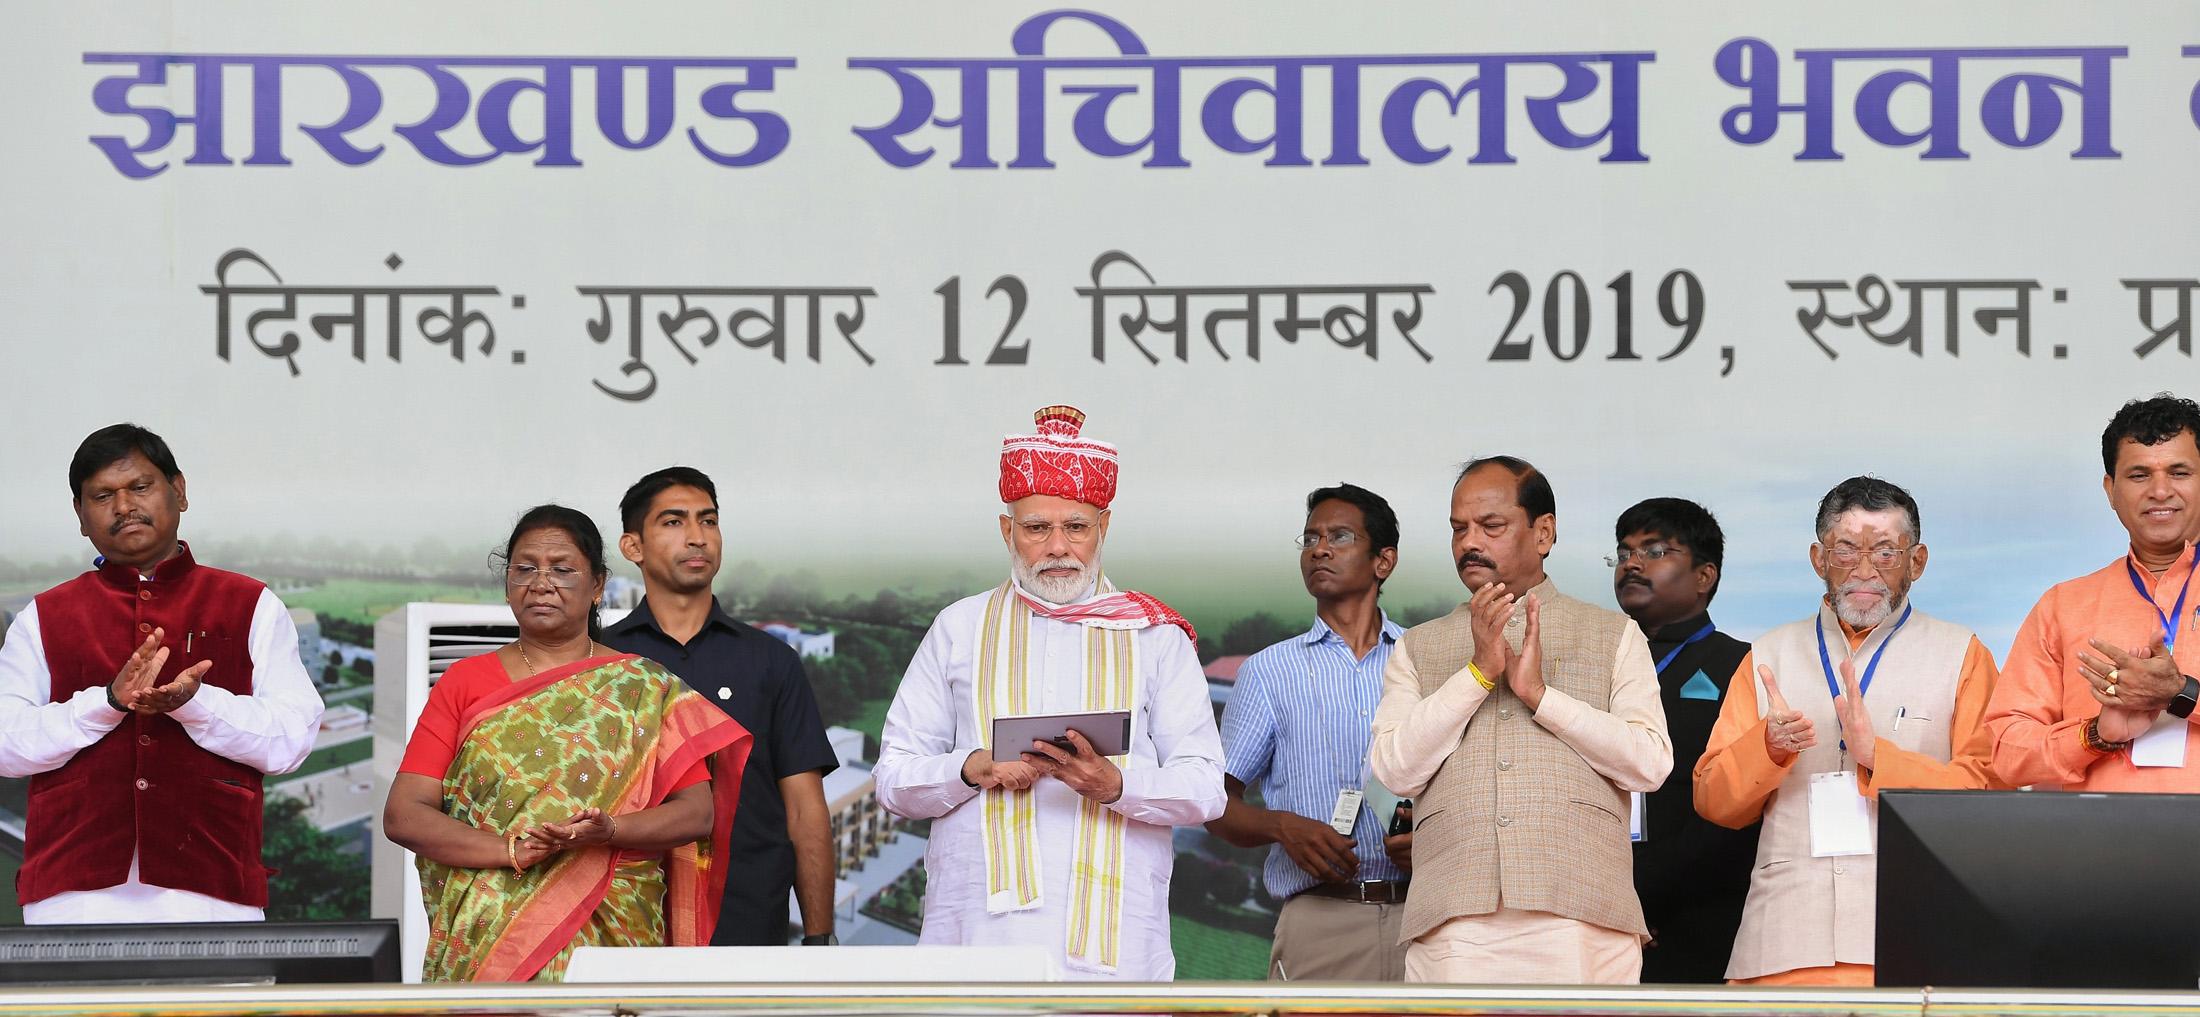 Narendra Modi launches pension schemes, inaugurates Jharkhand's Vidhan Sabha building